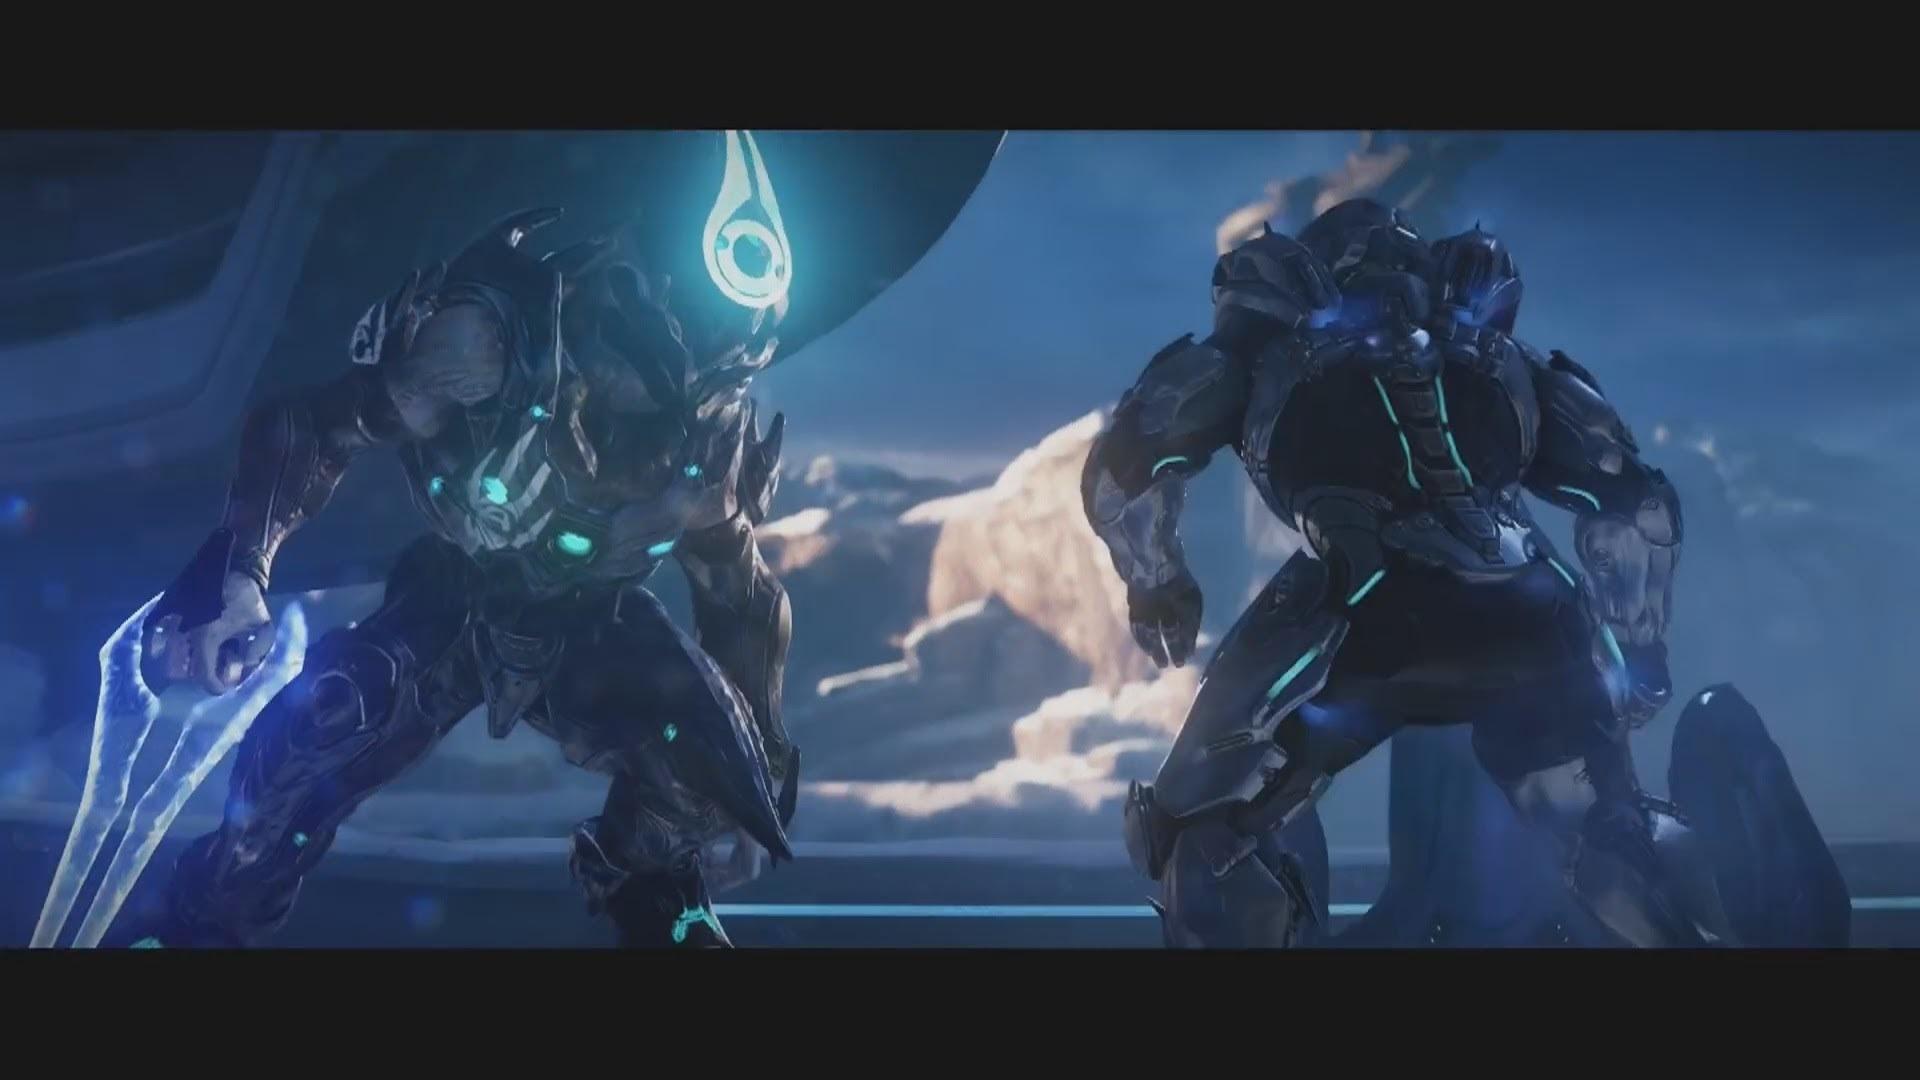 Halo 5 Arbiter Wallpaper 85 Images